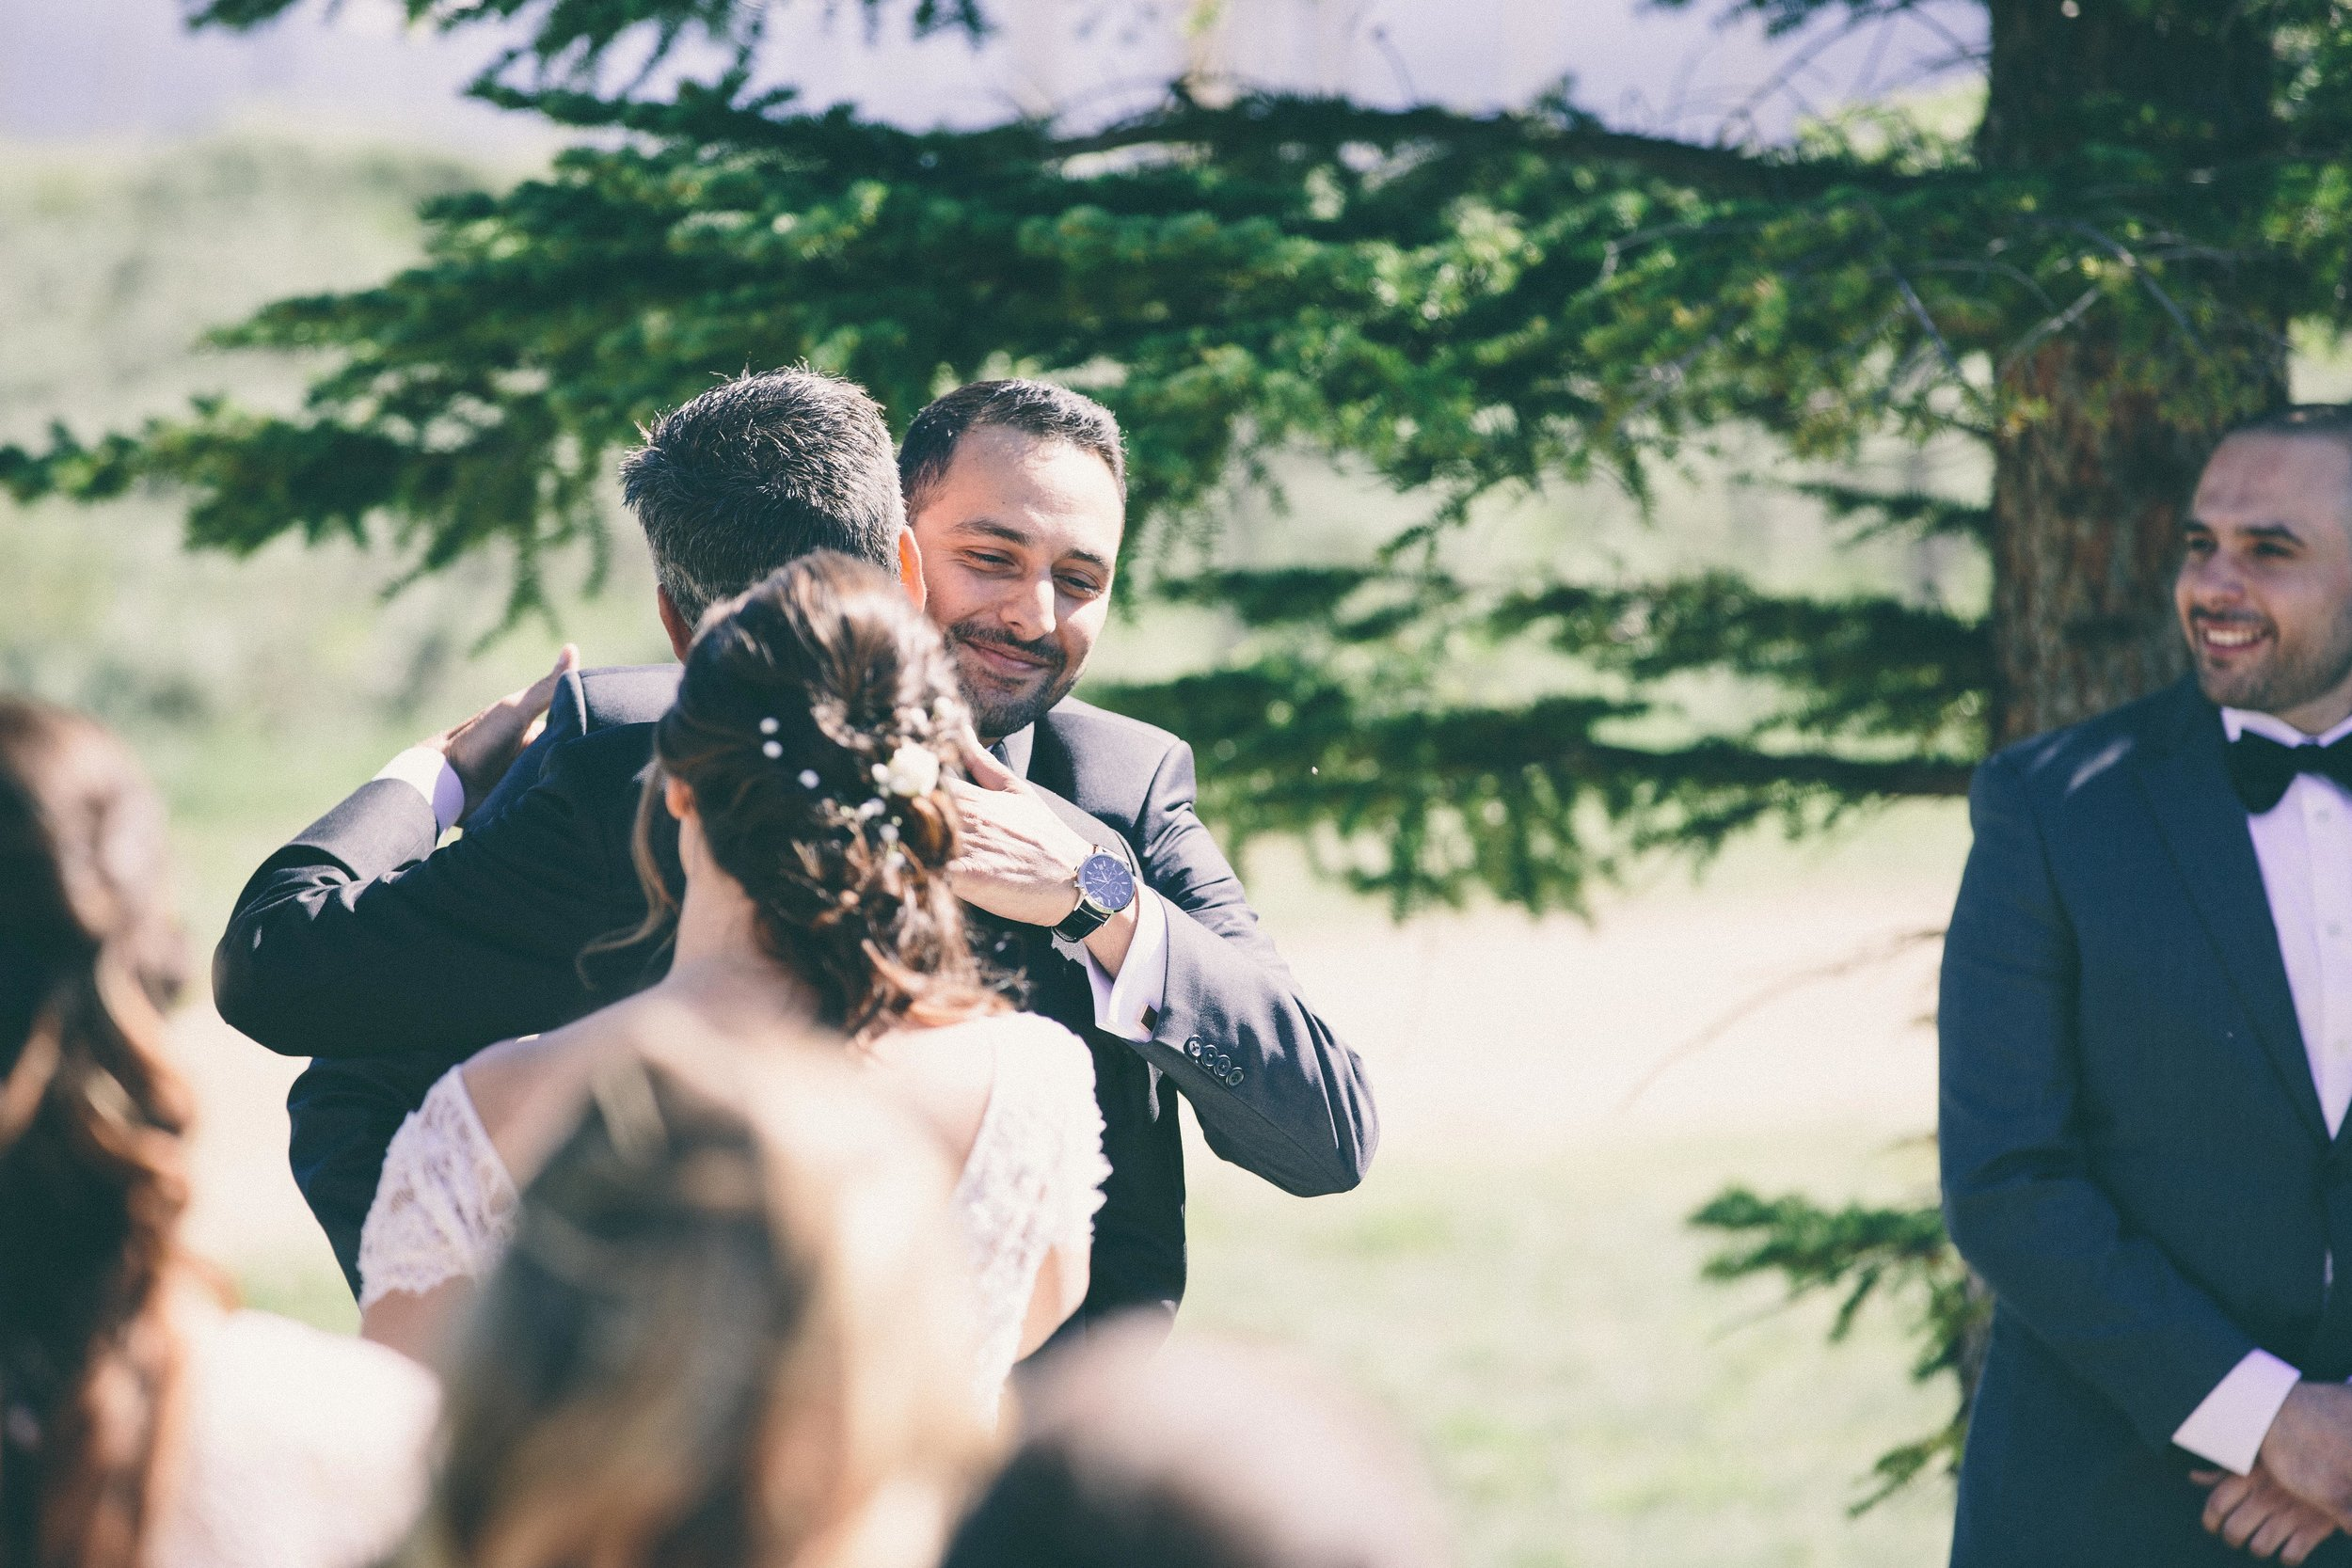 MP_16.06.19_Michael-&-Brittany-Wedding-4978.jpg